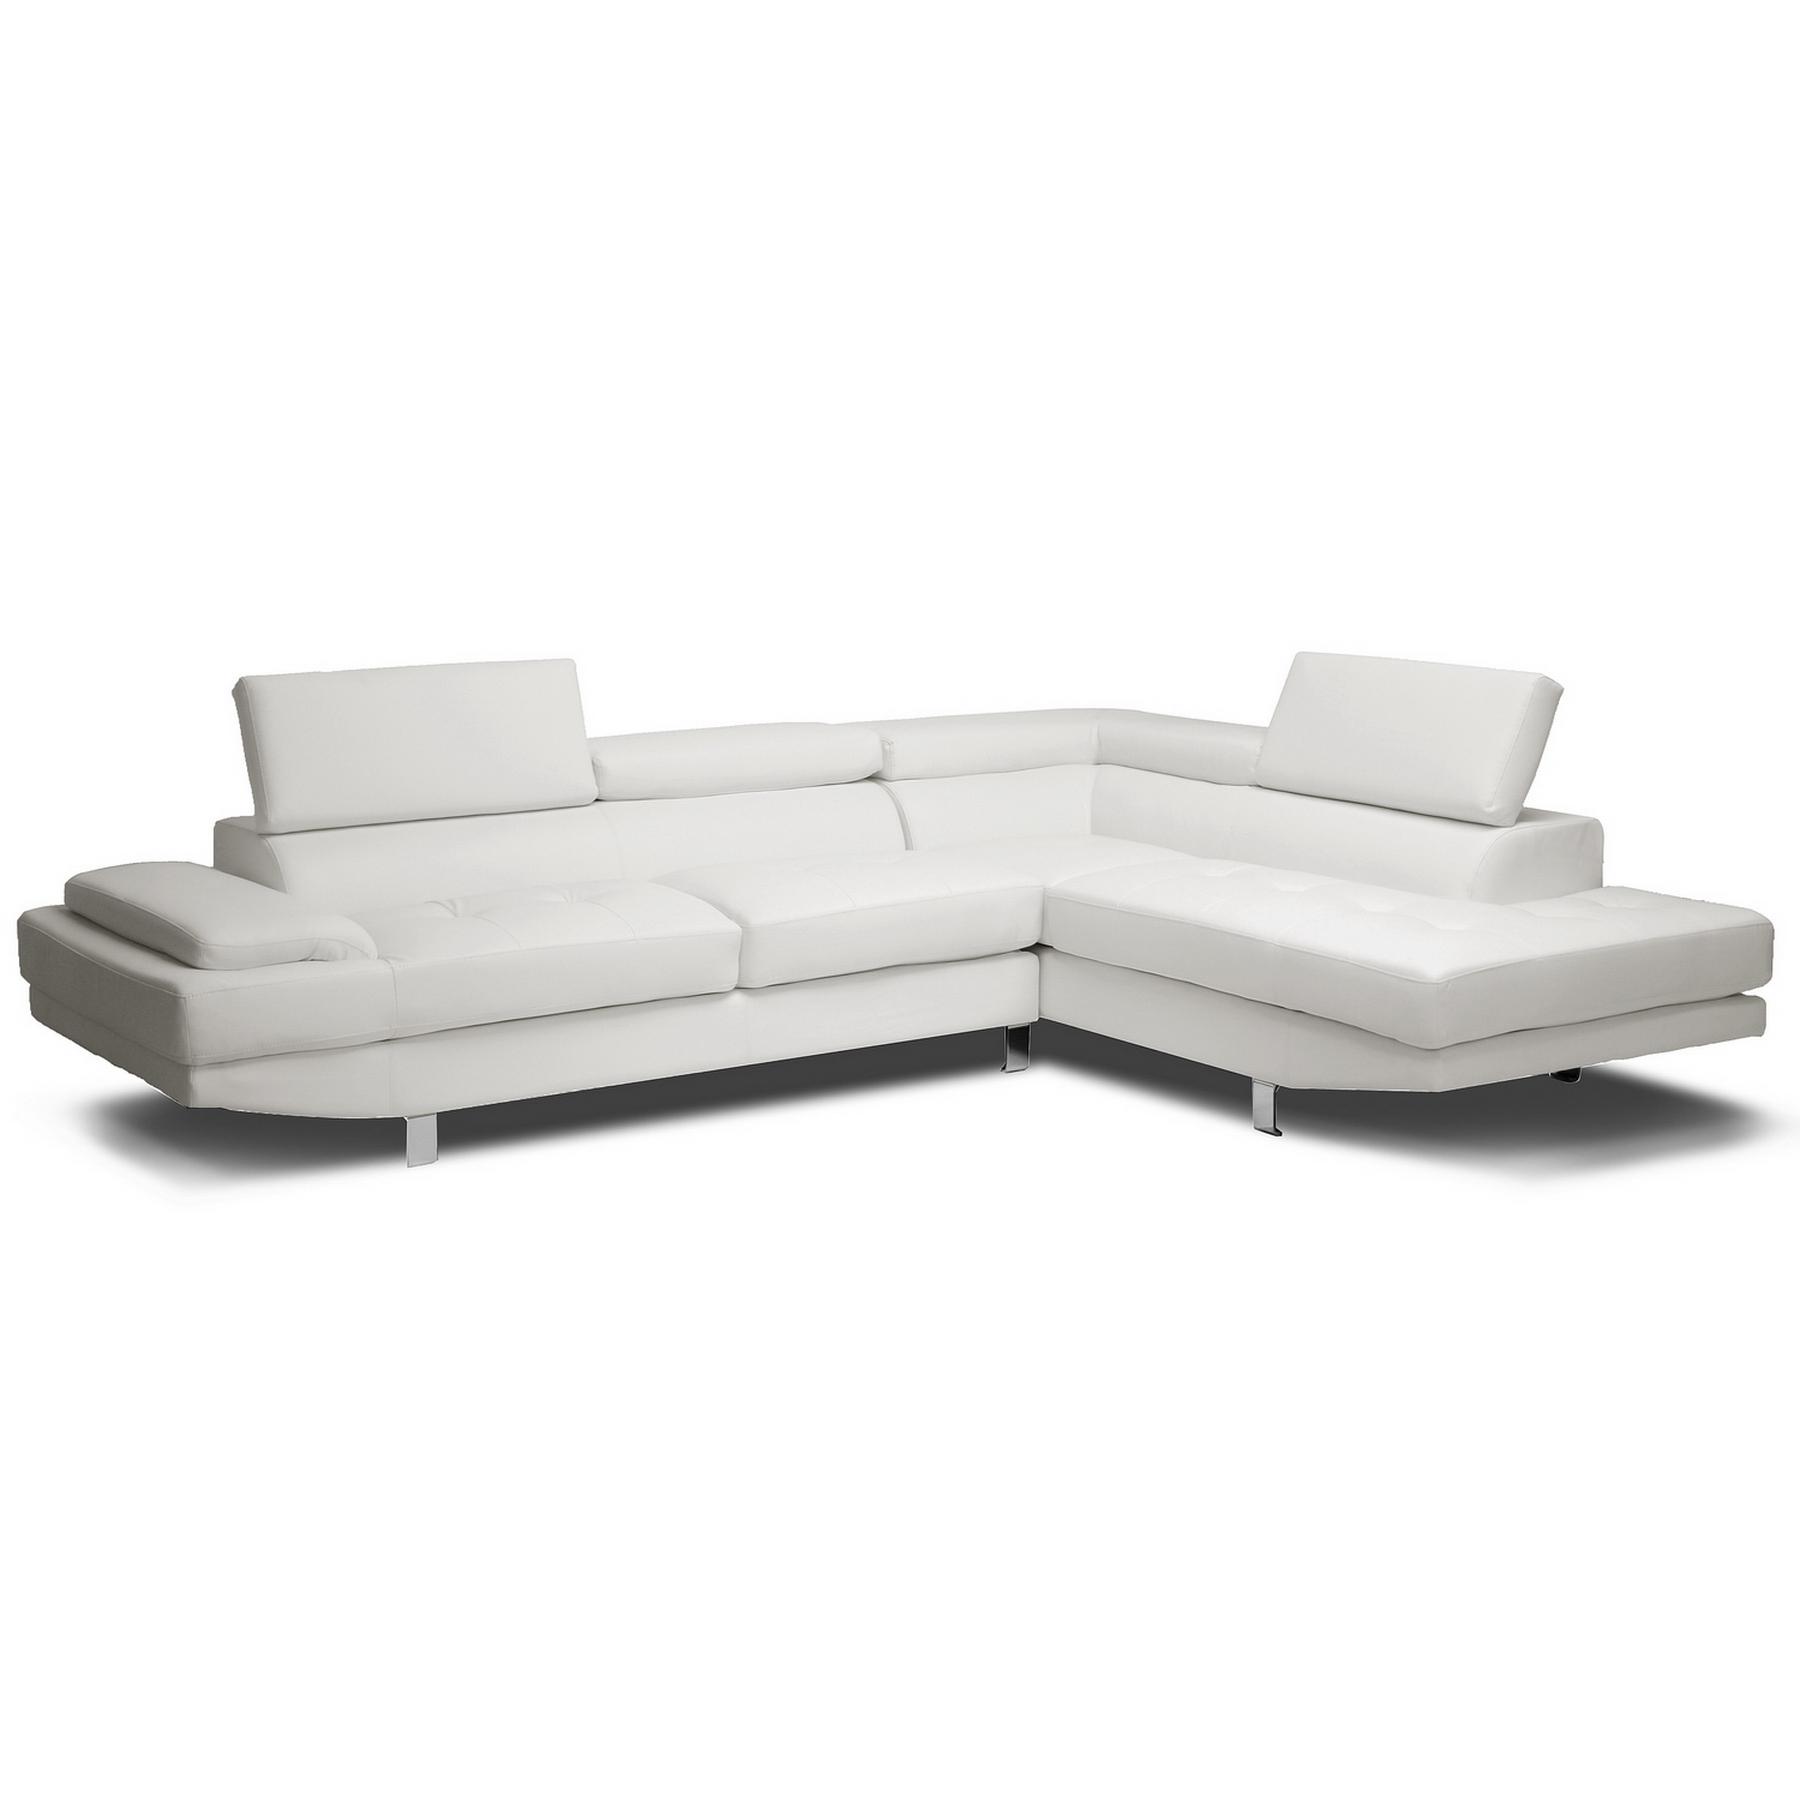 baby sofa chair malaysia bed single uk baxton studio selma white leather modern sectional